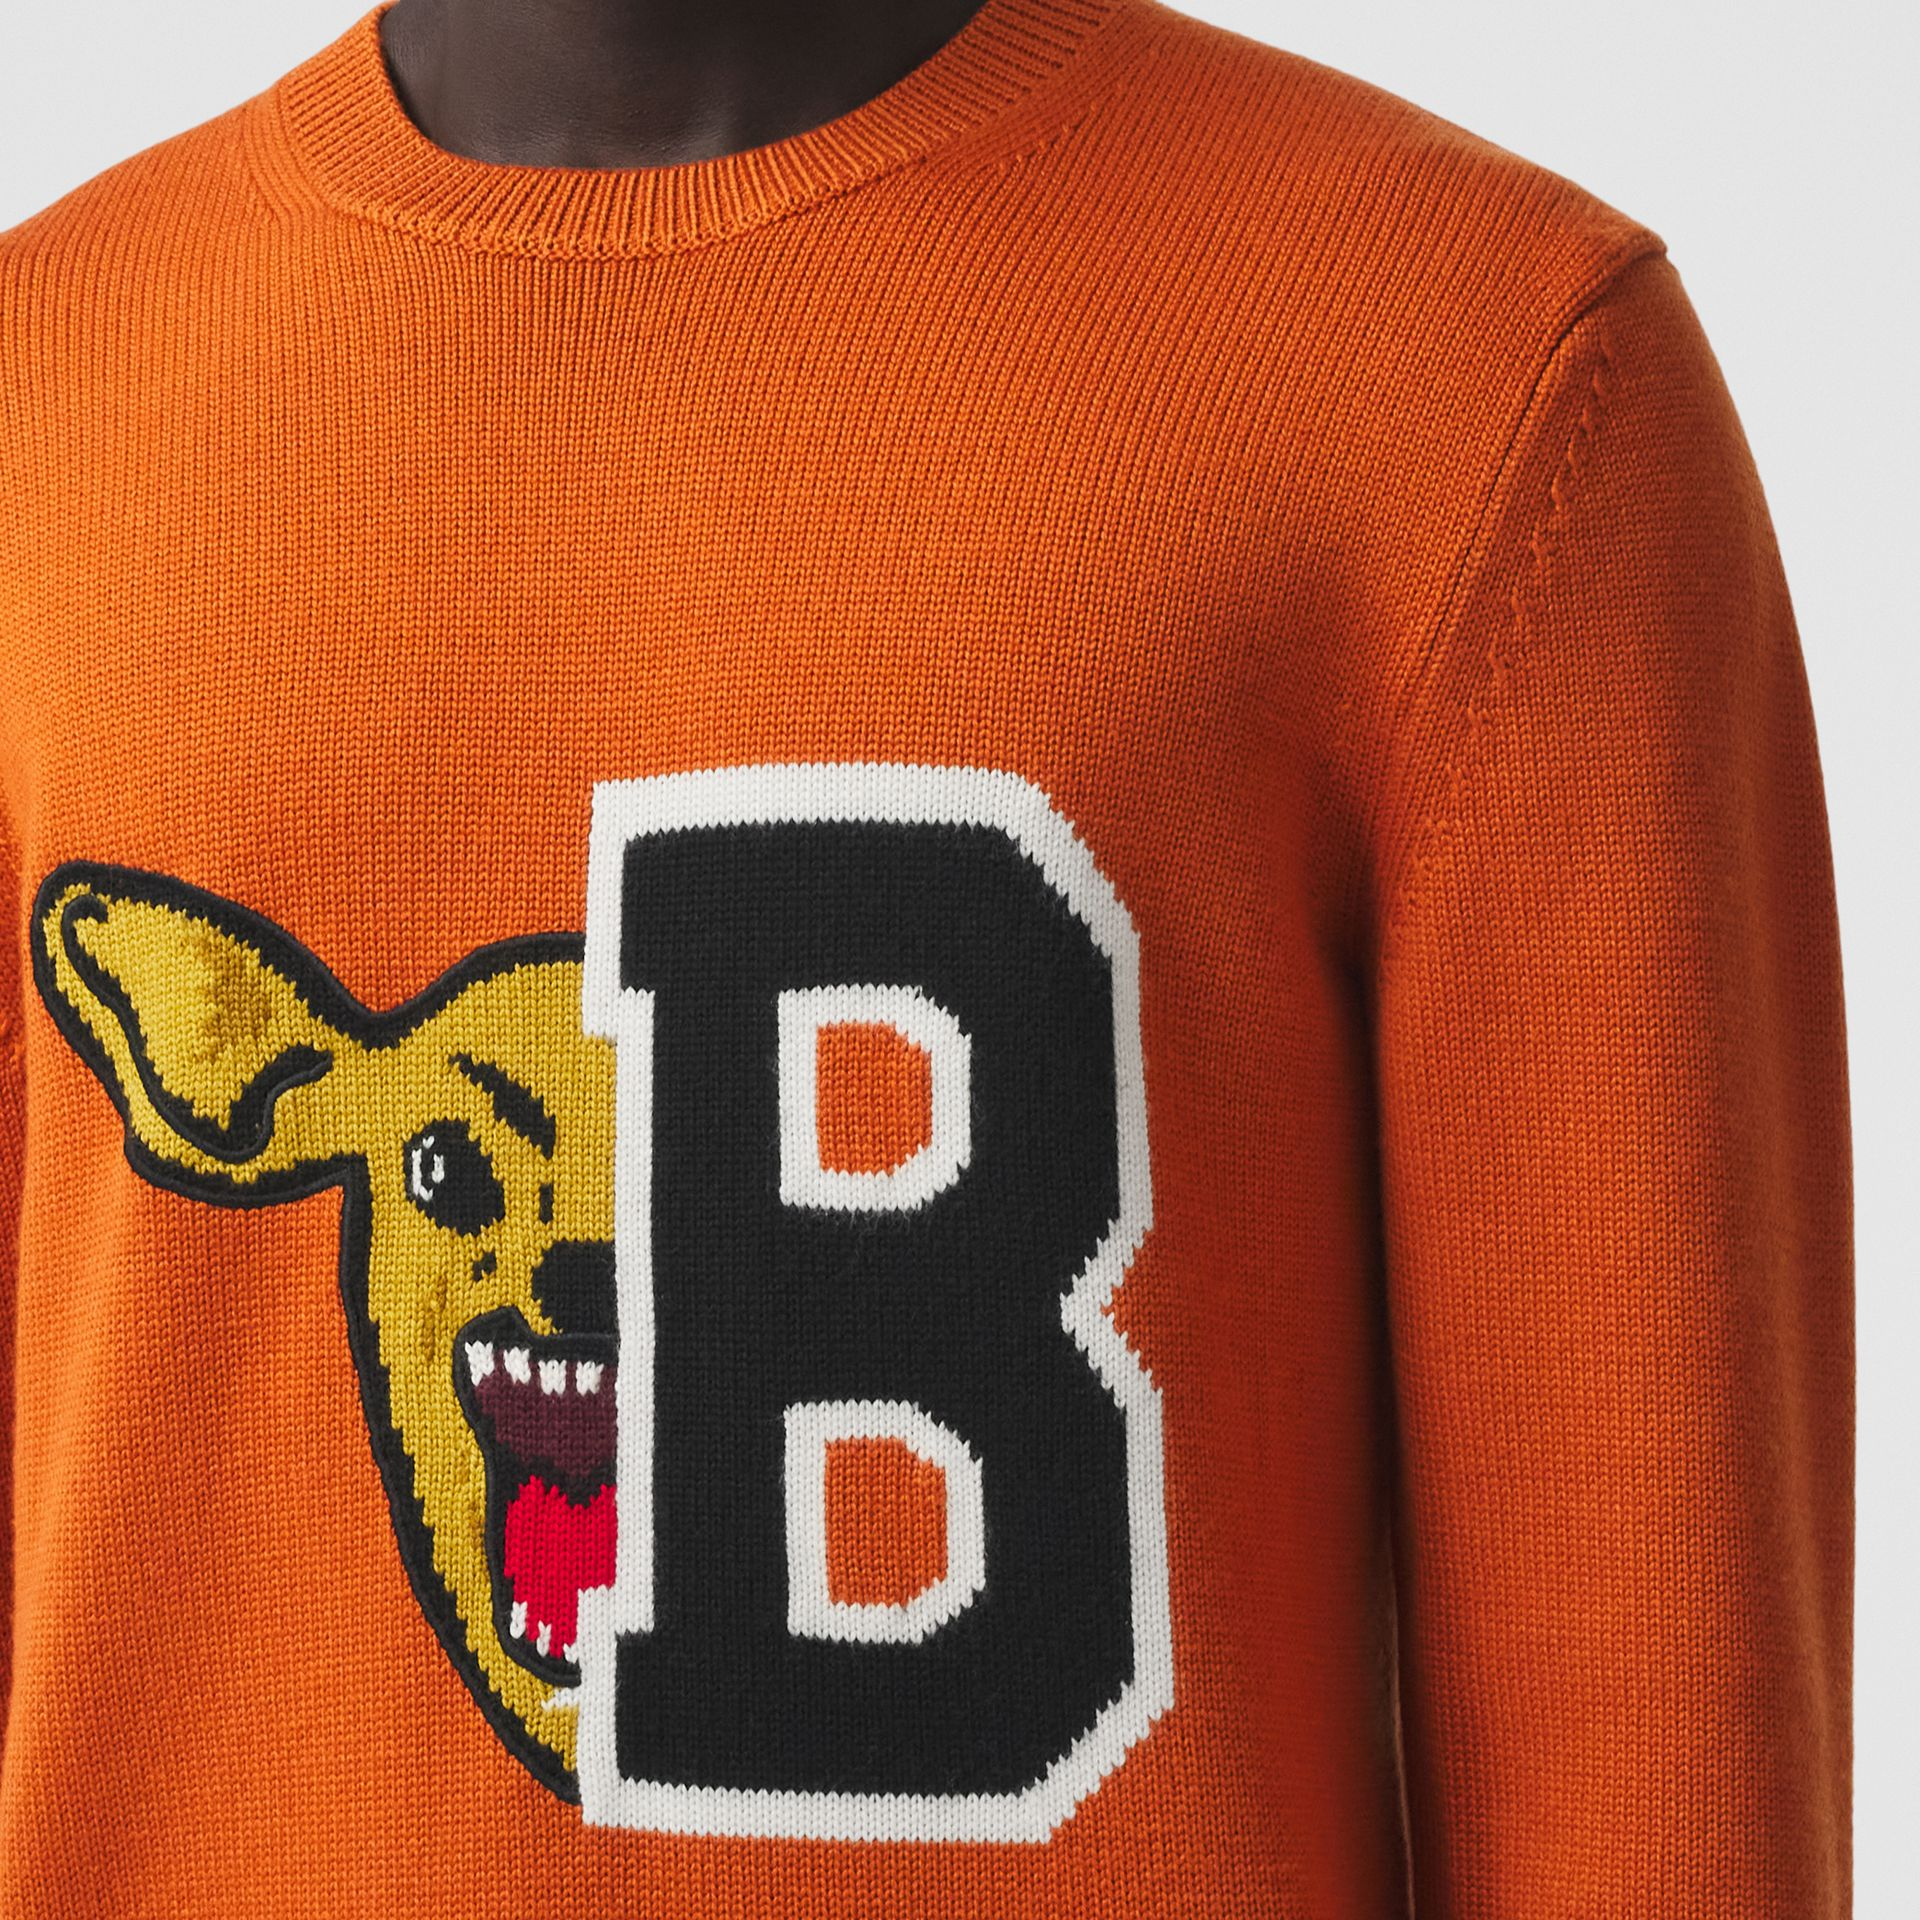 Varsity Graphic Merino Wool Jacquard Sweater in Burnt Orange - Men   Burberry - gallery image 1